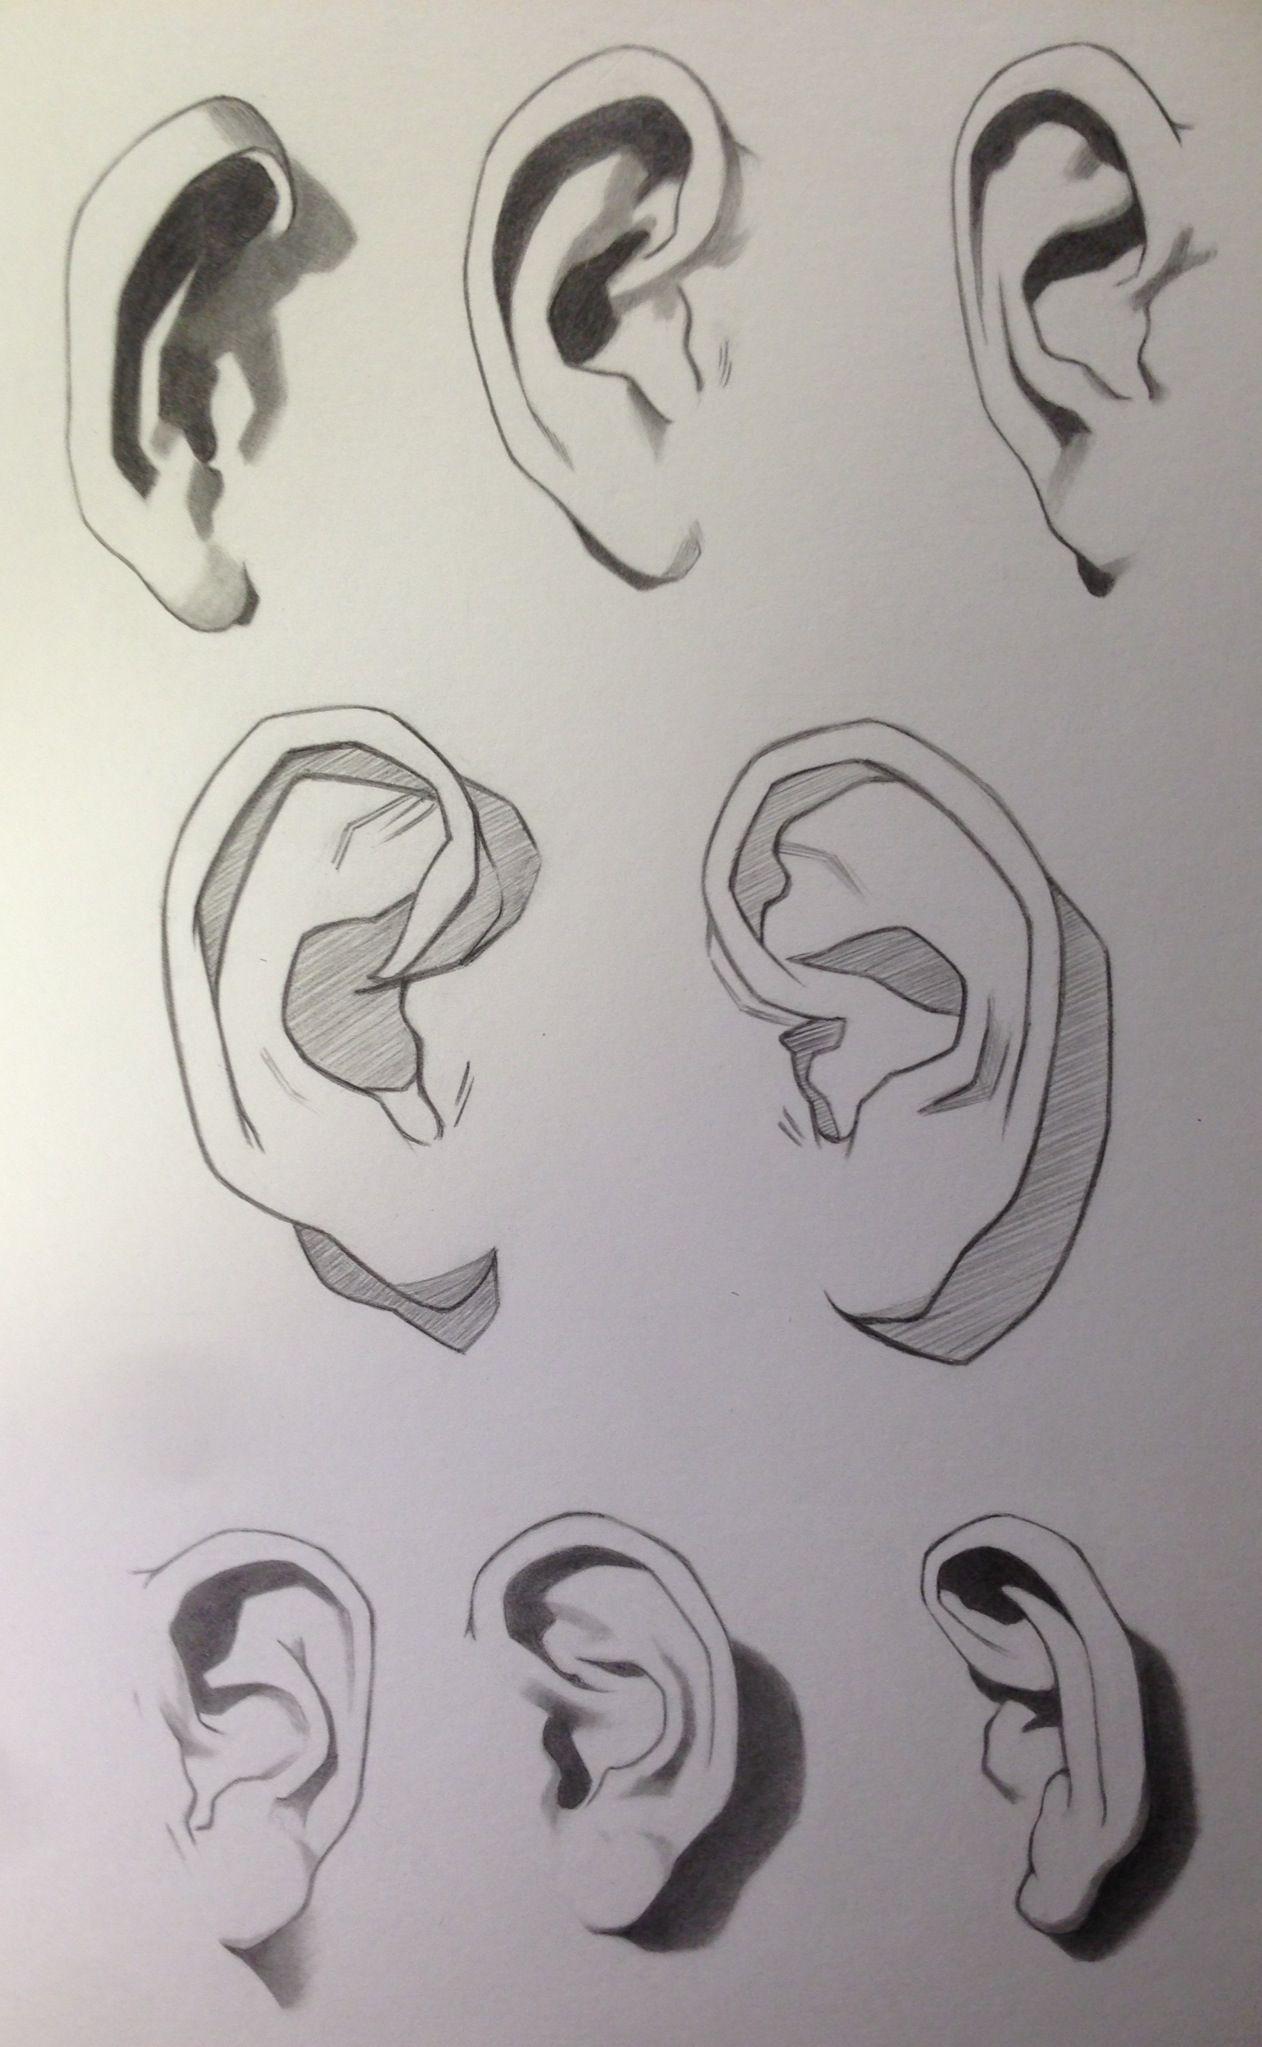 Orejas | Dibujos | Pinterest | Anatomía, Dibujo y Dibujar